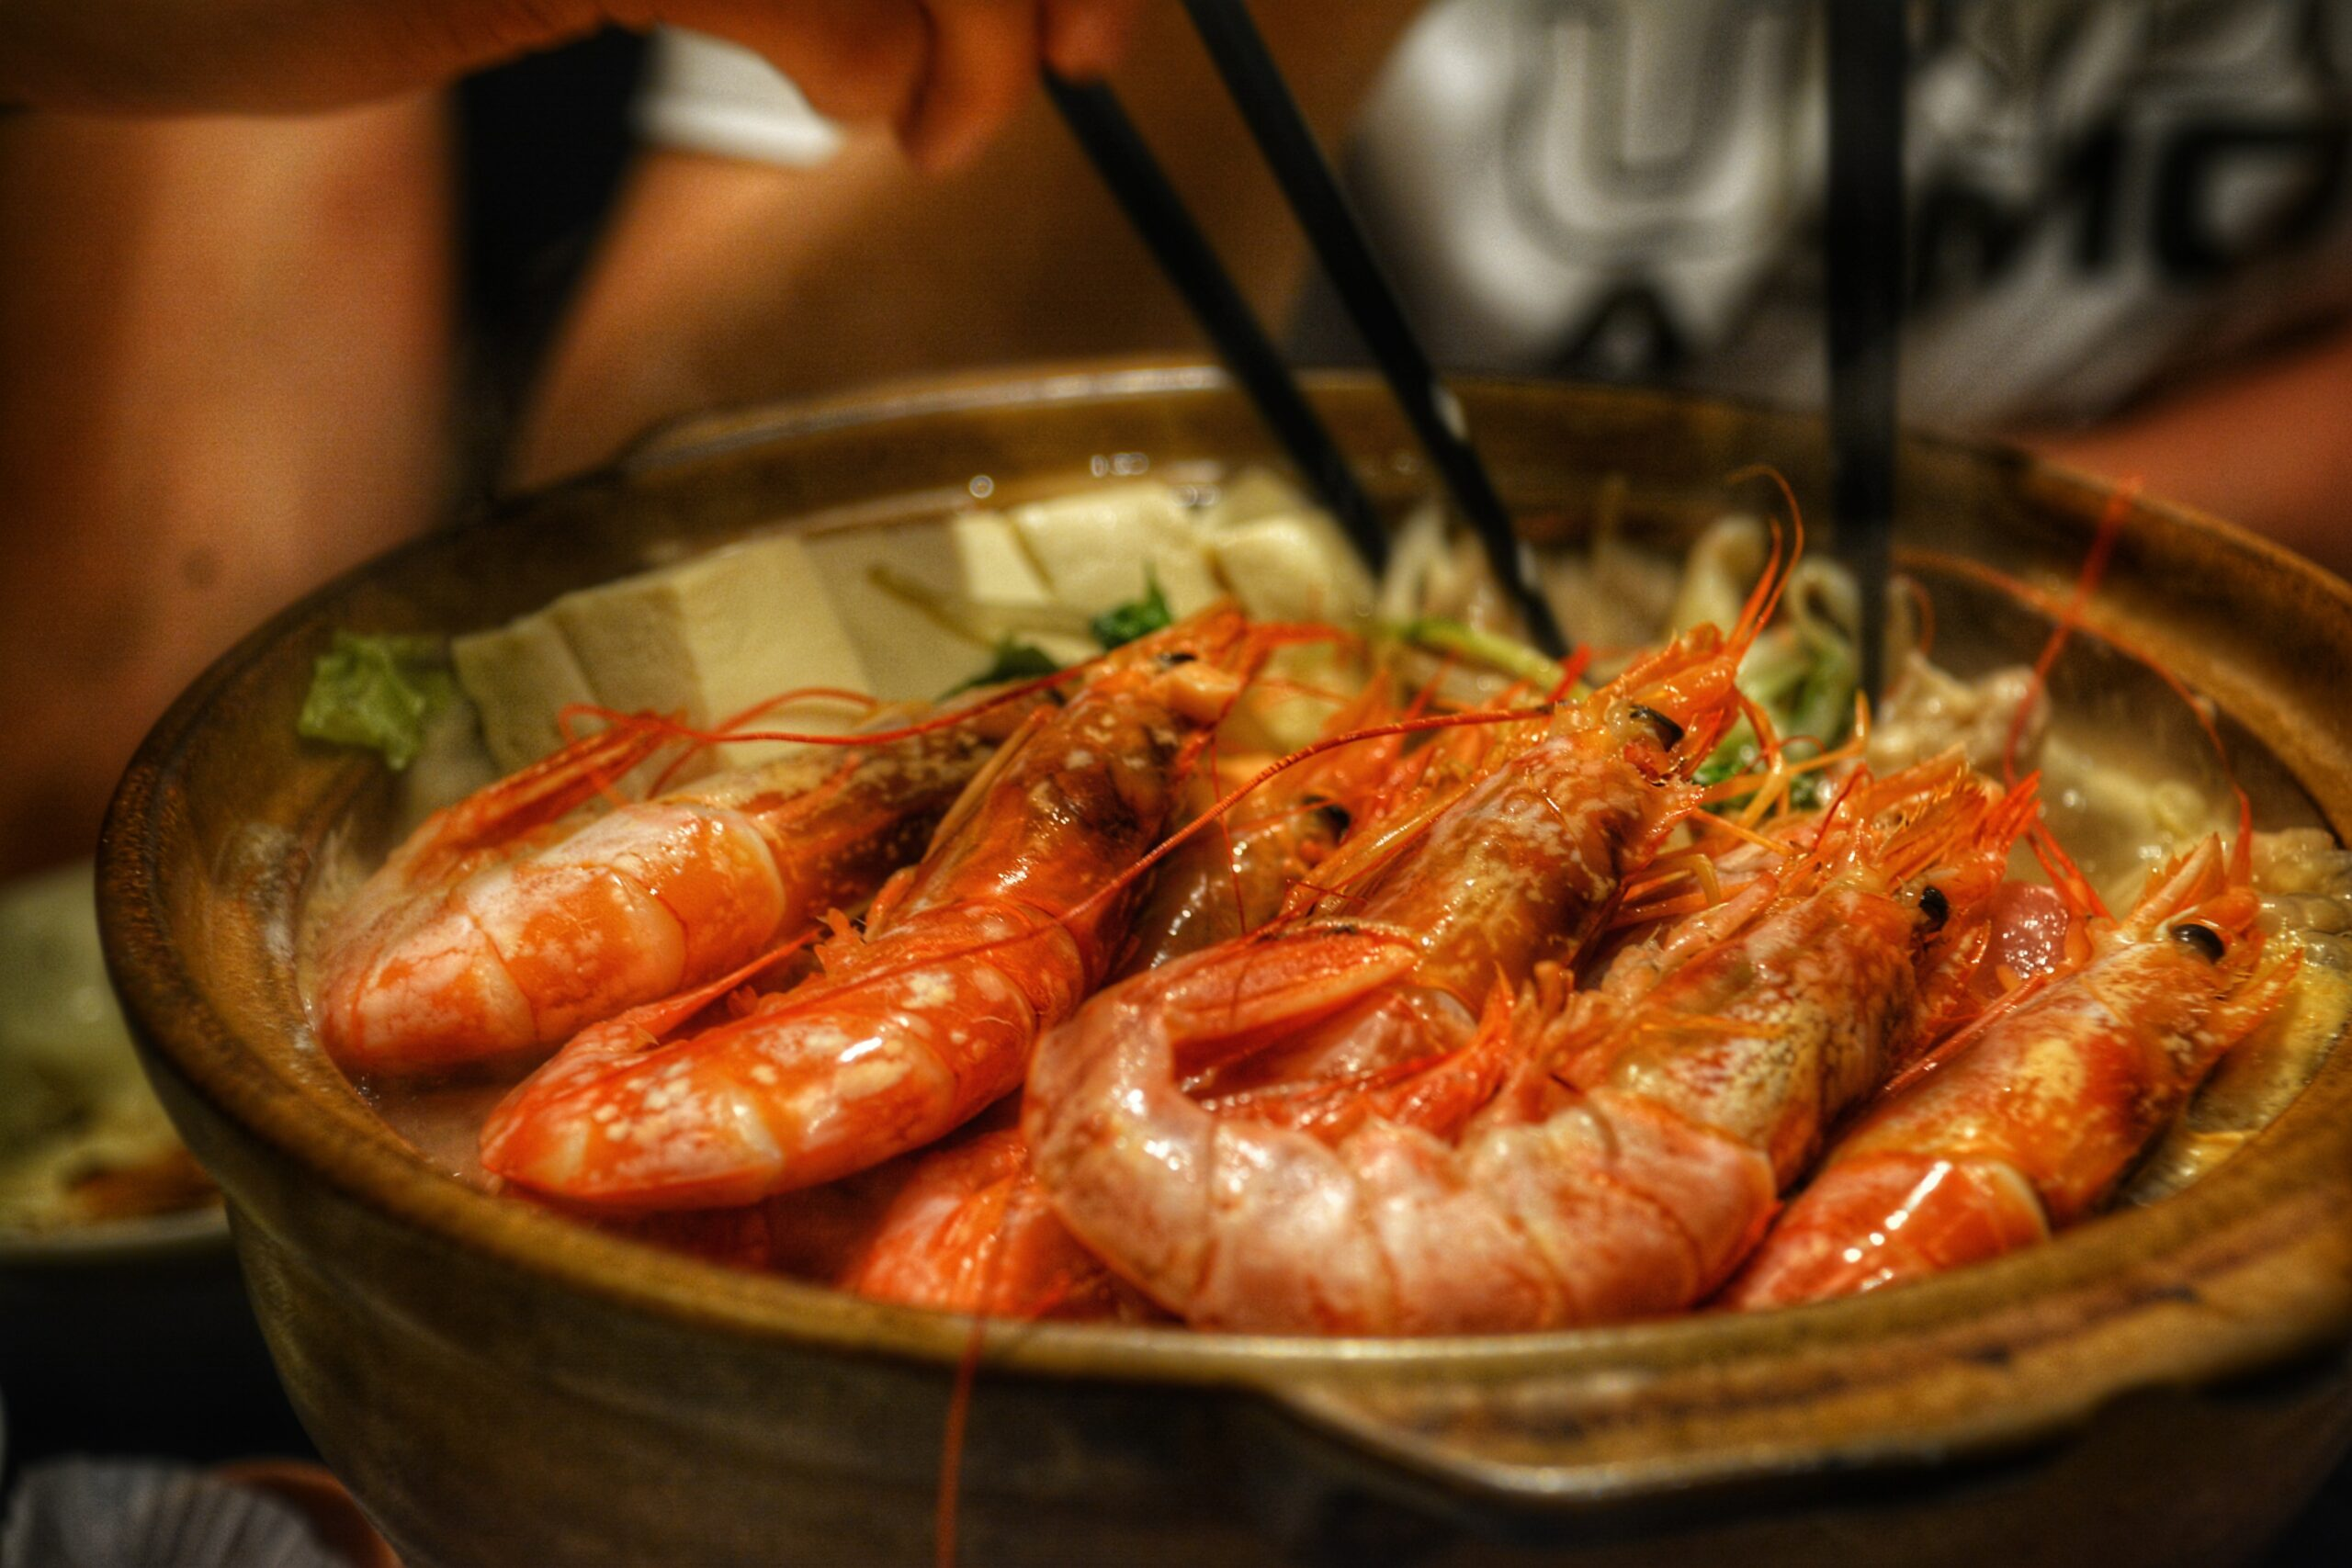 cooked shrimps on brown ceramic bowl